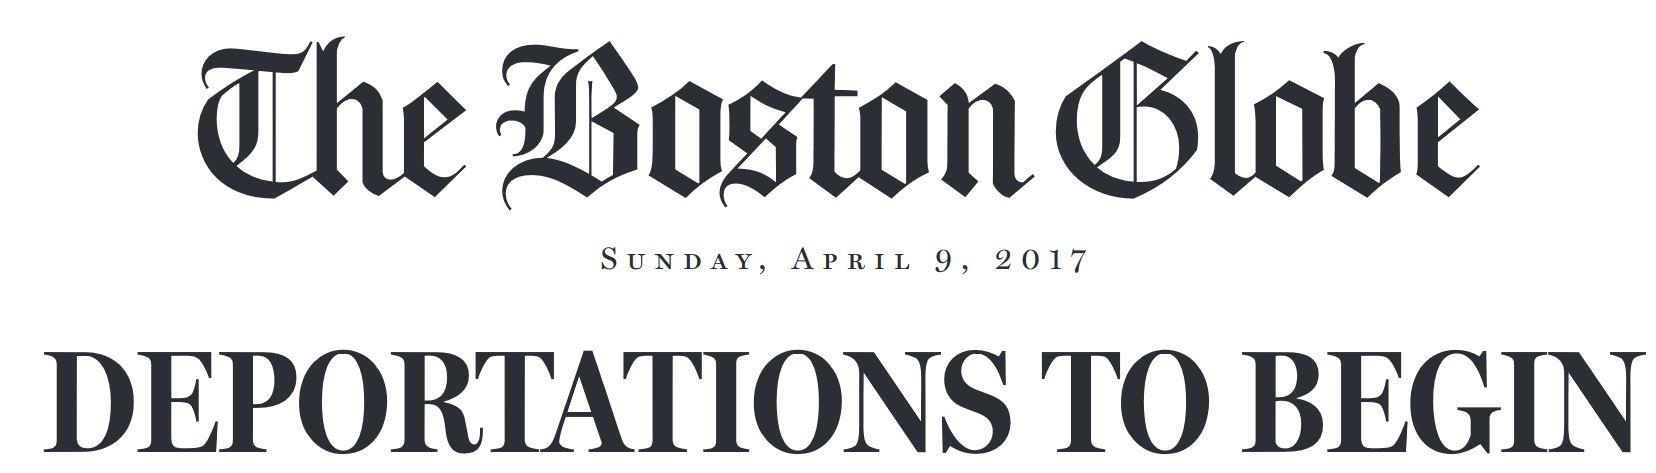 Boston Globe Sunday News